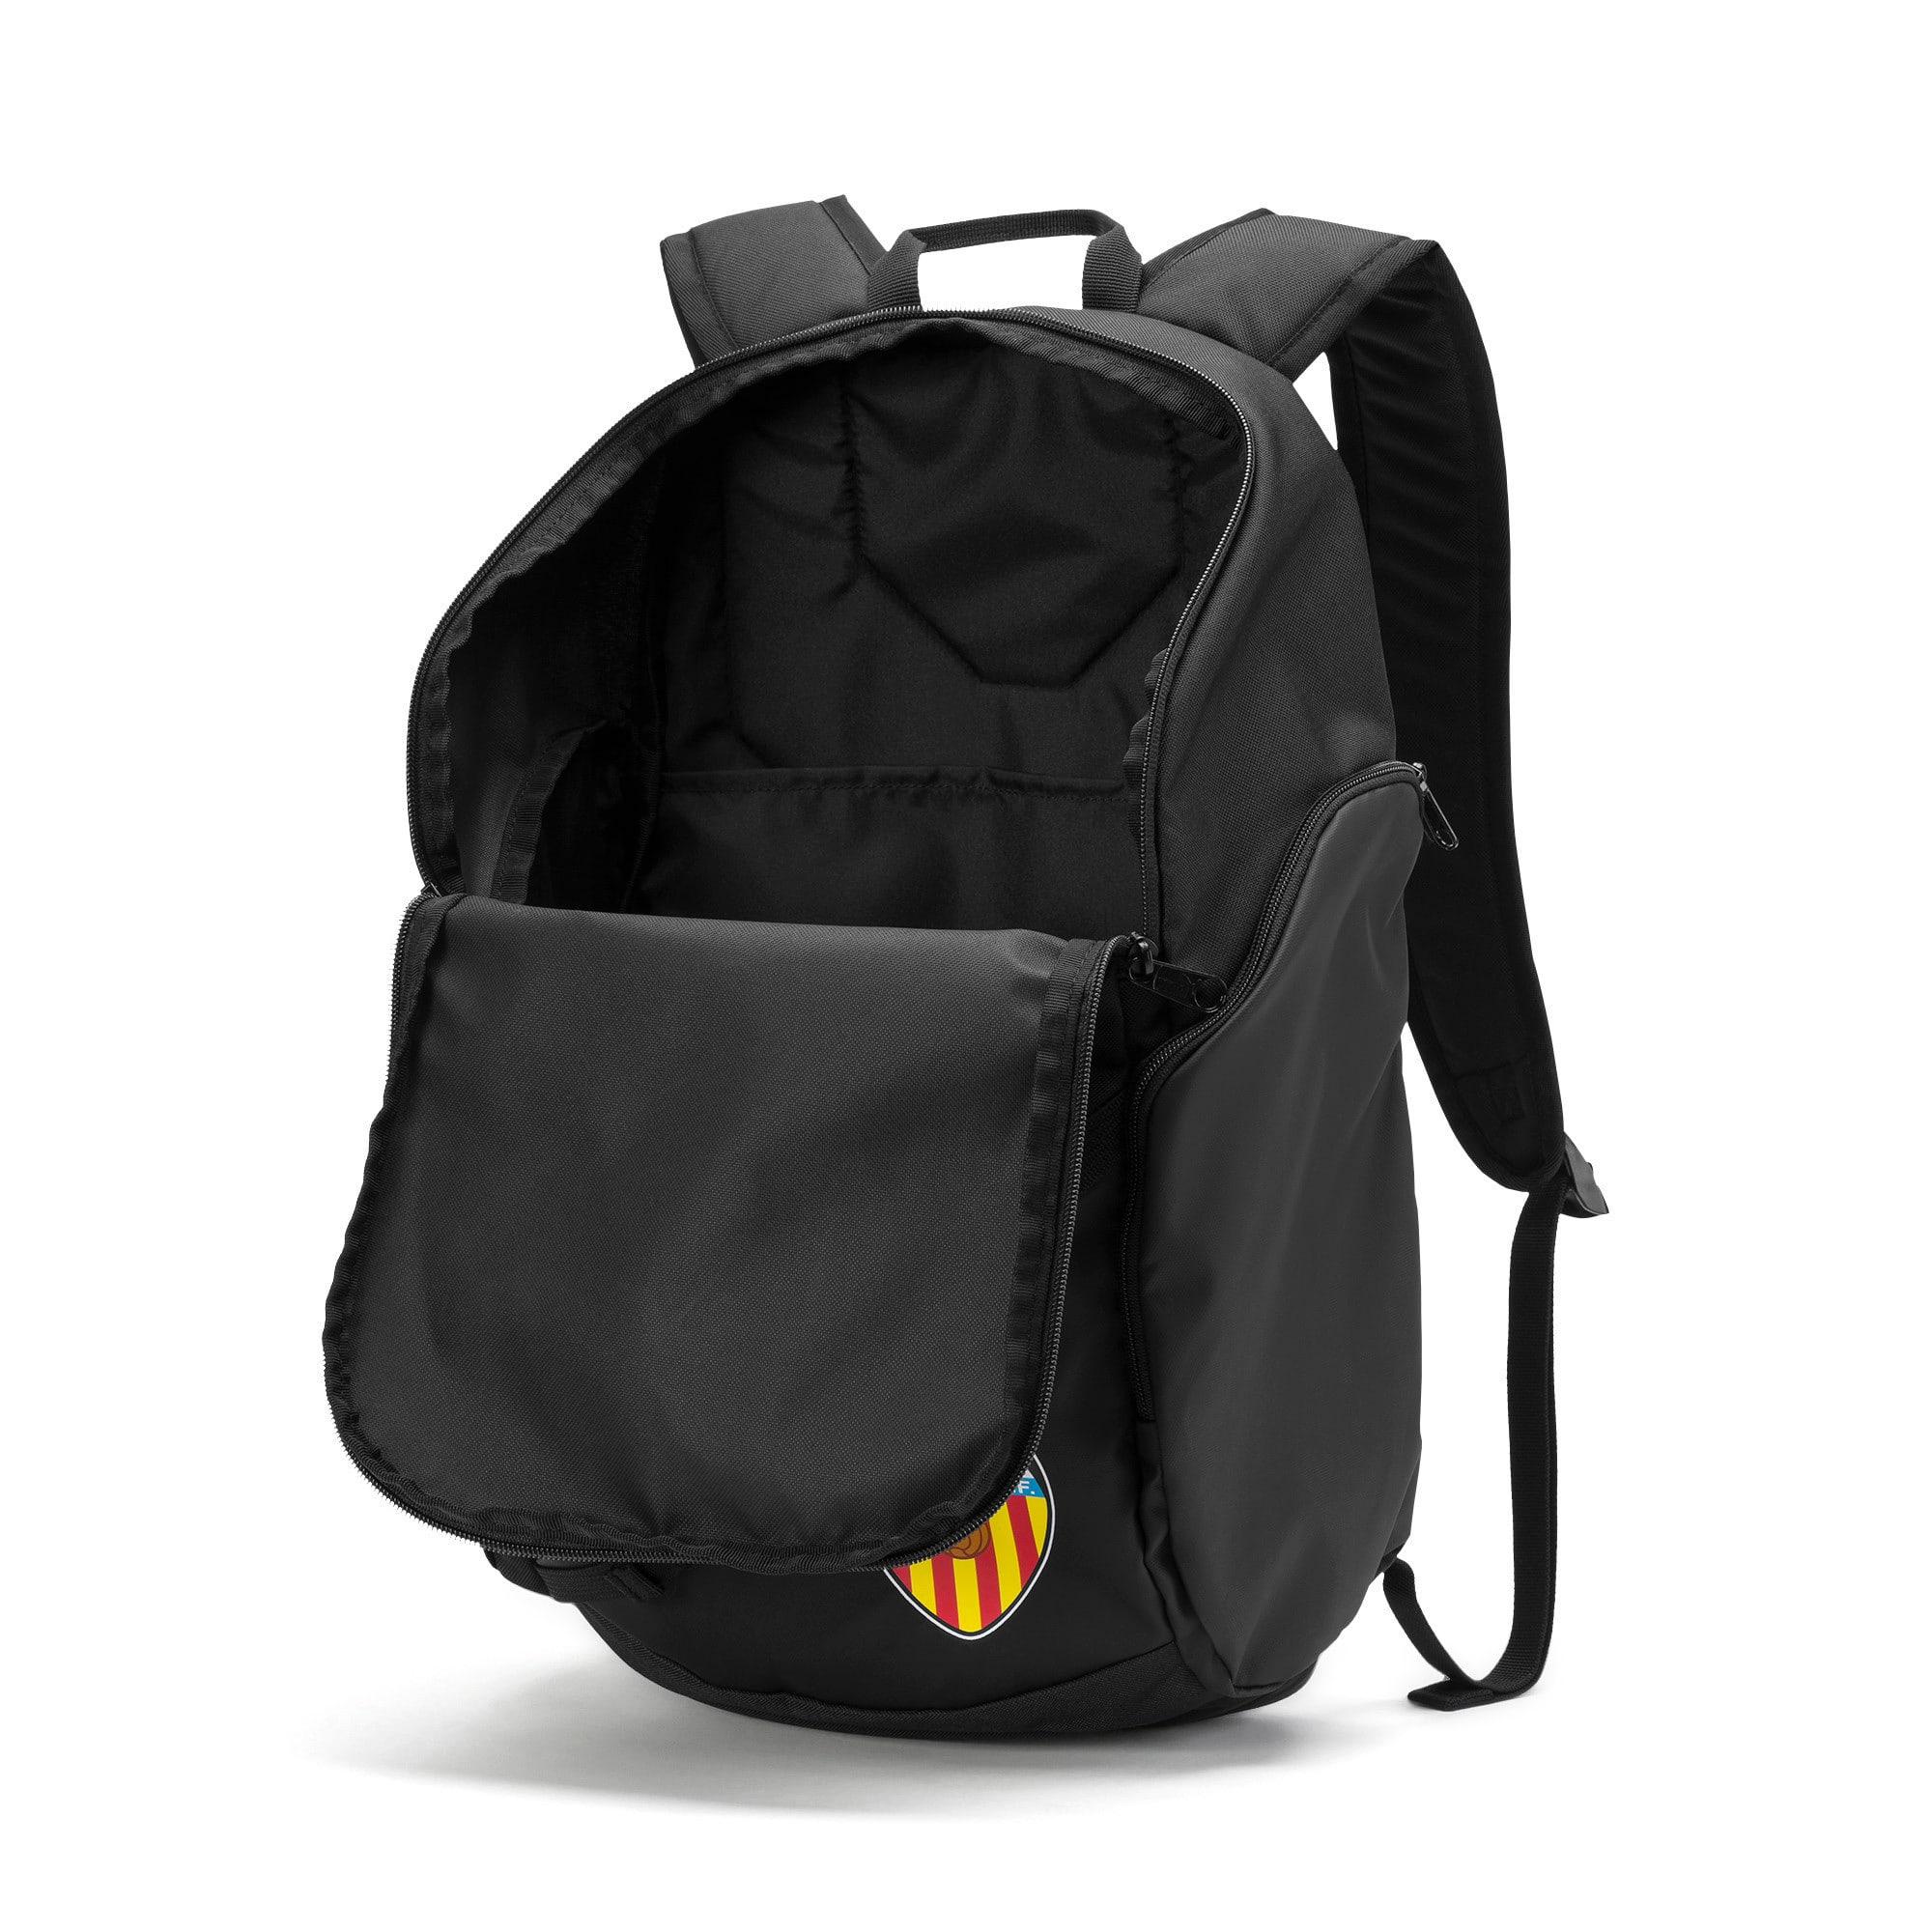 Thumbnail 3 of Valencia CF LIGA Football Backpack, Puma Black-Puma White, medium